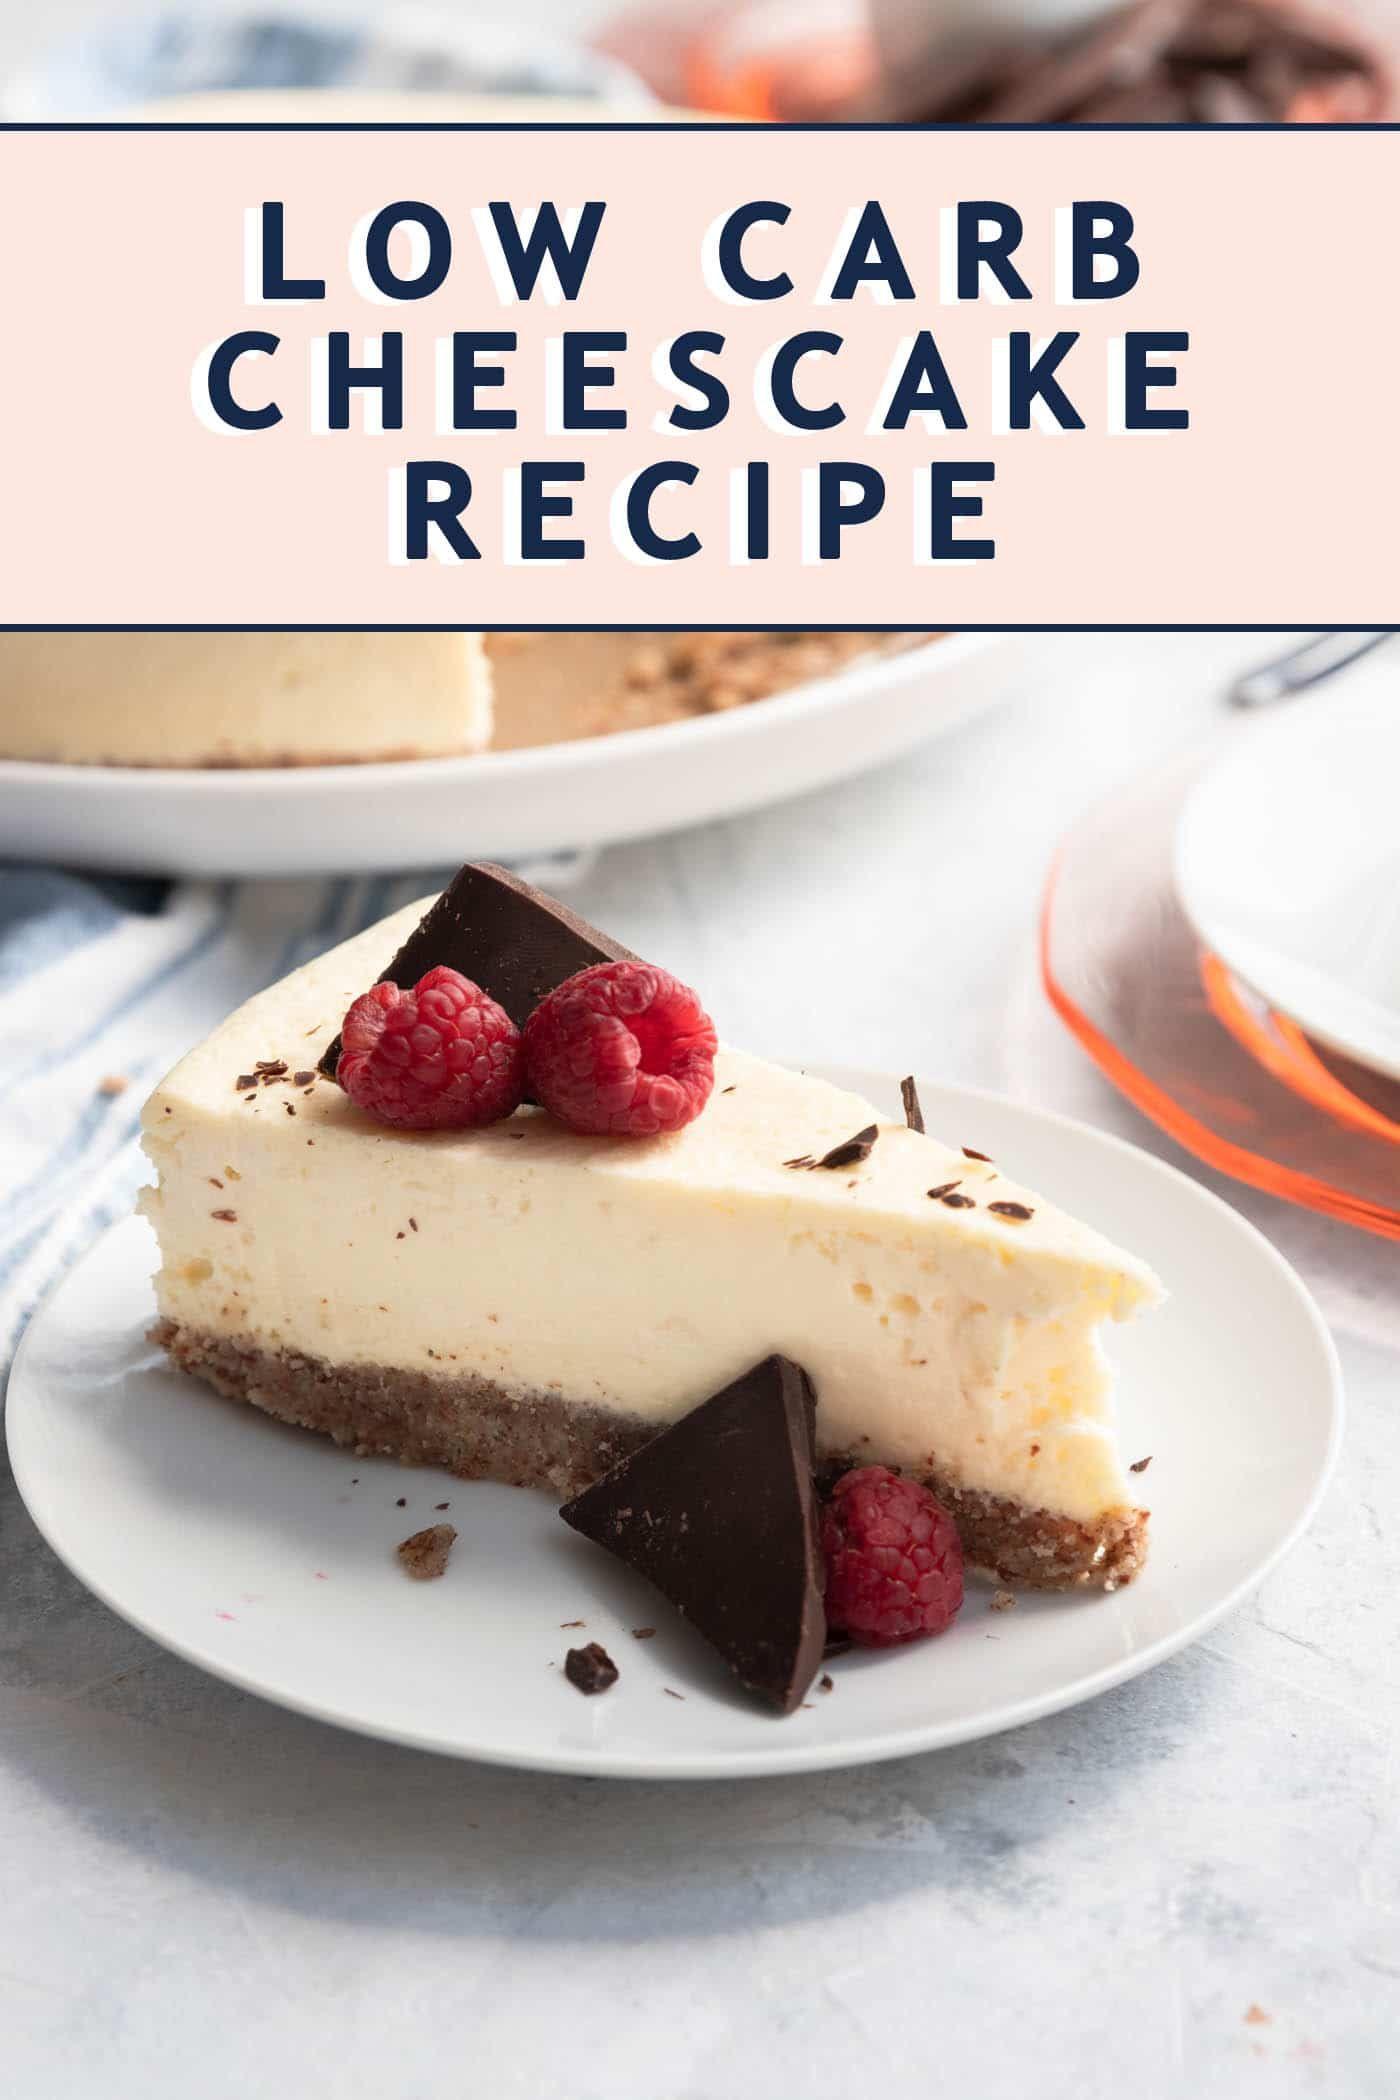 Keto Cheesecake Low Carb Cheesecake Recipe Sugar Cloth Recipe In 2020 Low Carb Cheesecake Recipe Cheesecake Recipes Low Carb Cheesecake